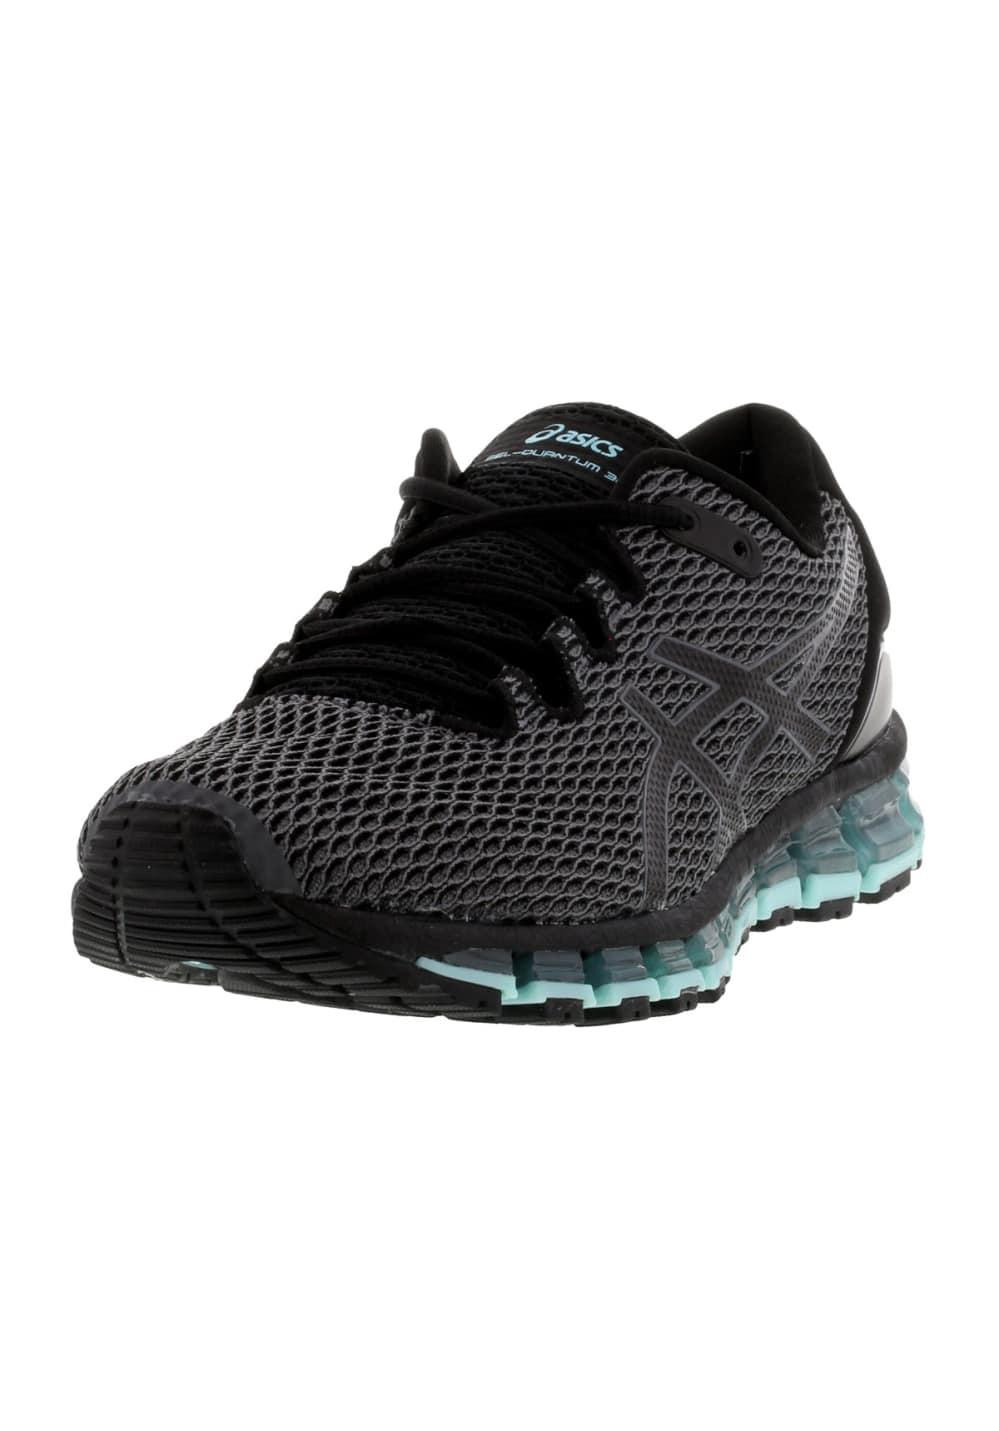 on sale 63973 8b114 ASICS GEL-Quantum 360 Shift MX - Zapatillas de running para Mujer - Negro